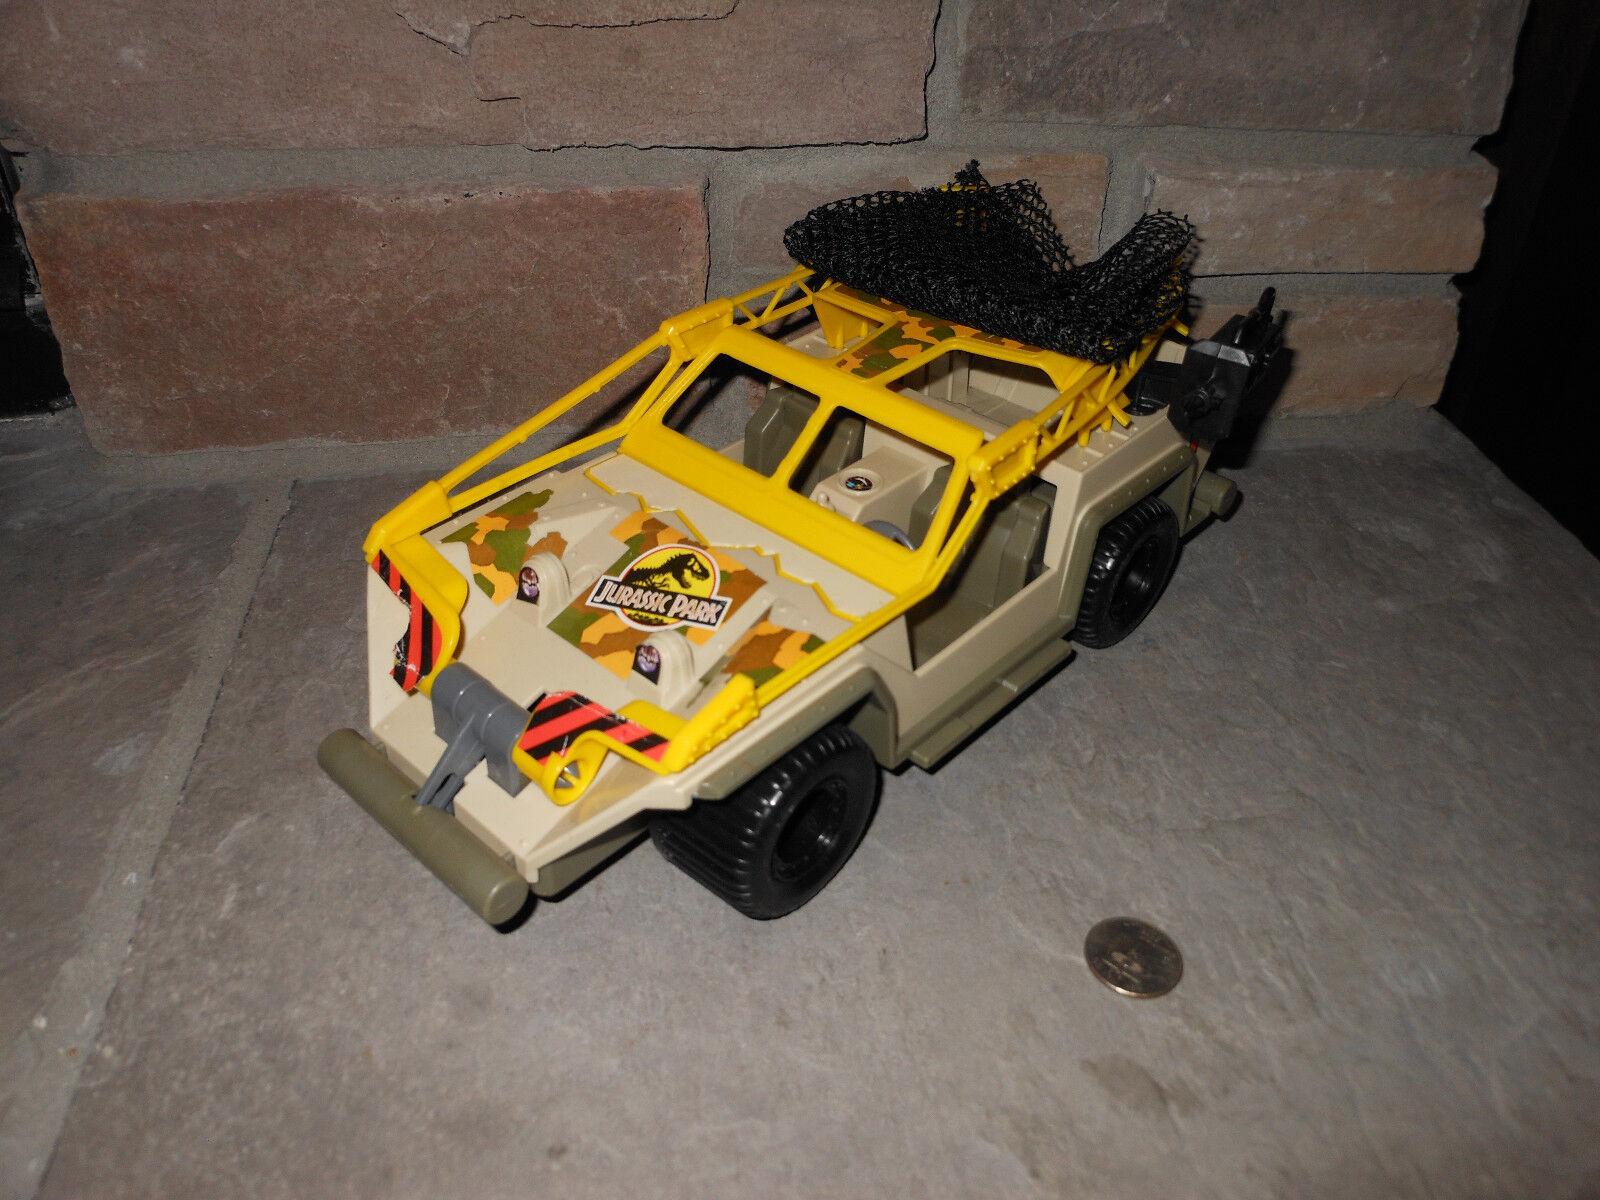 Jurassic Park Series 2 Capture Cruiser complete    READ cde9aa